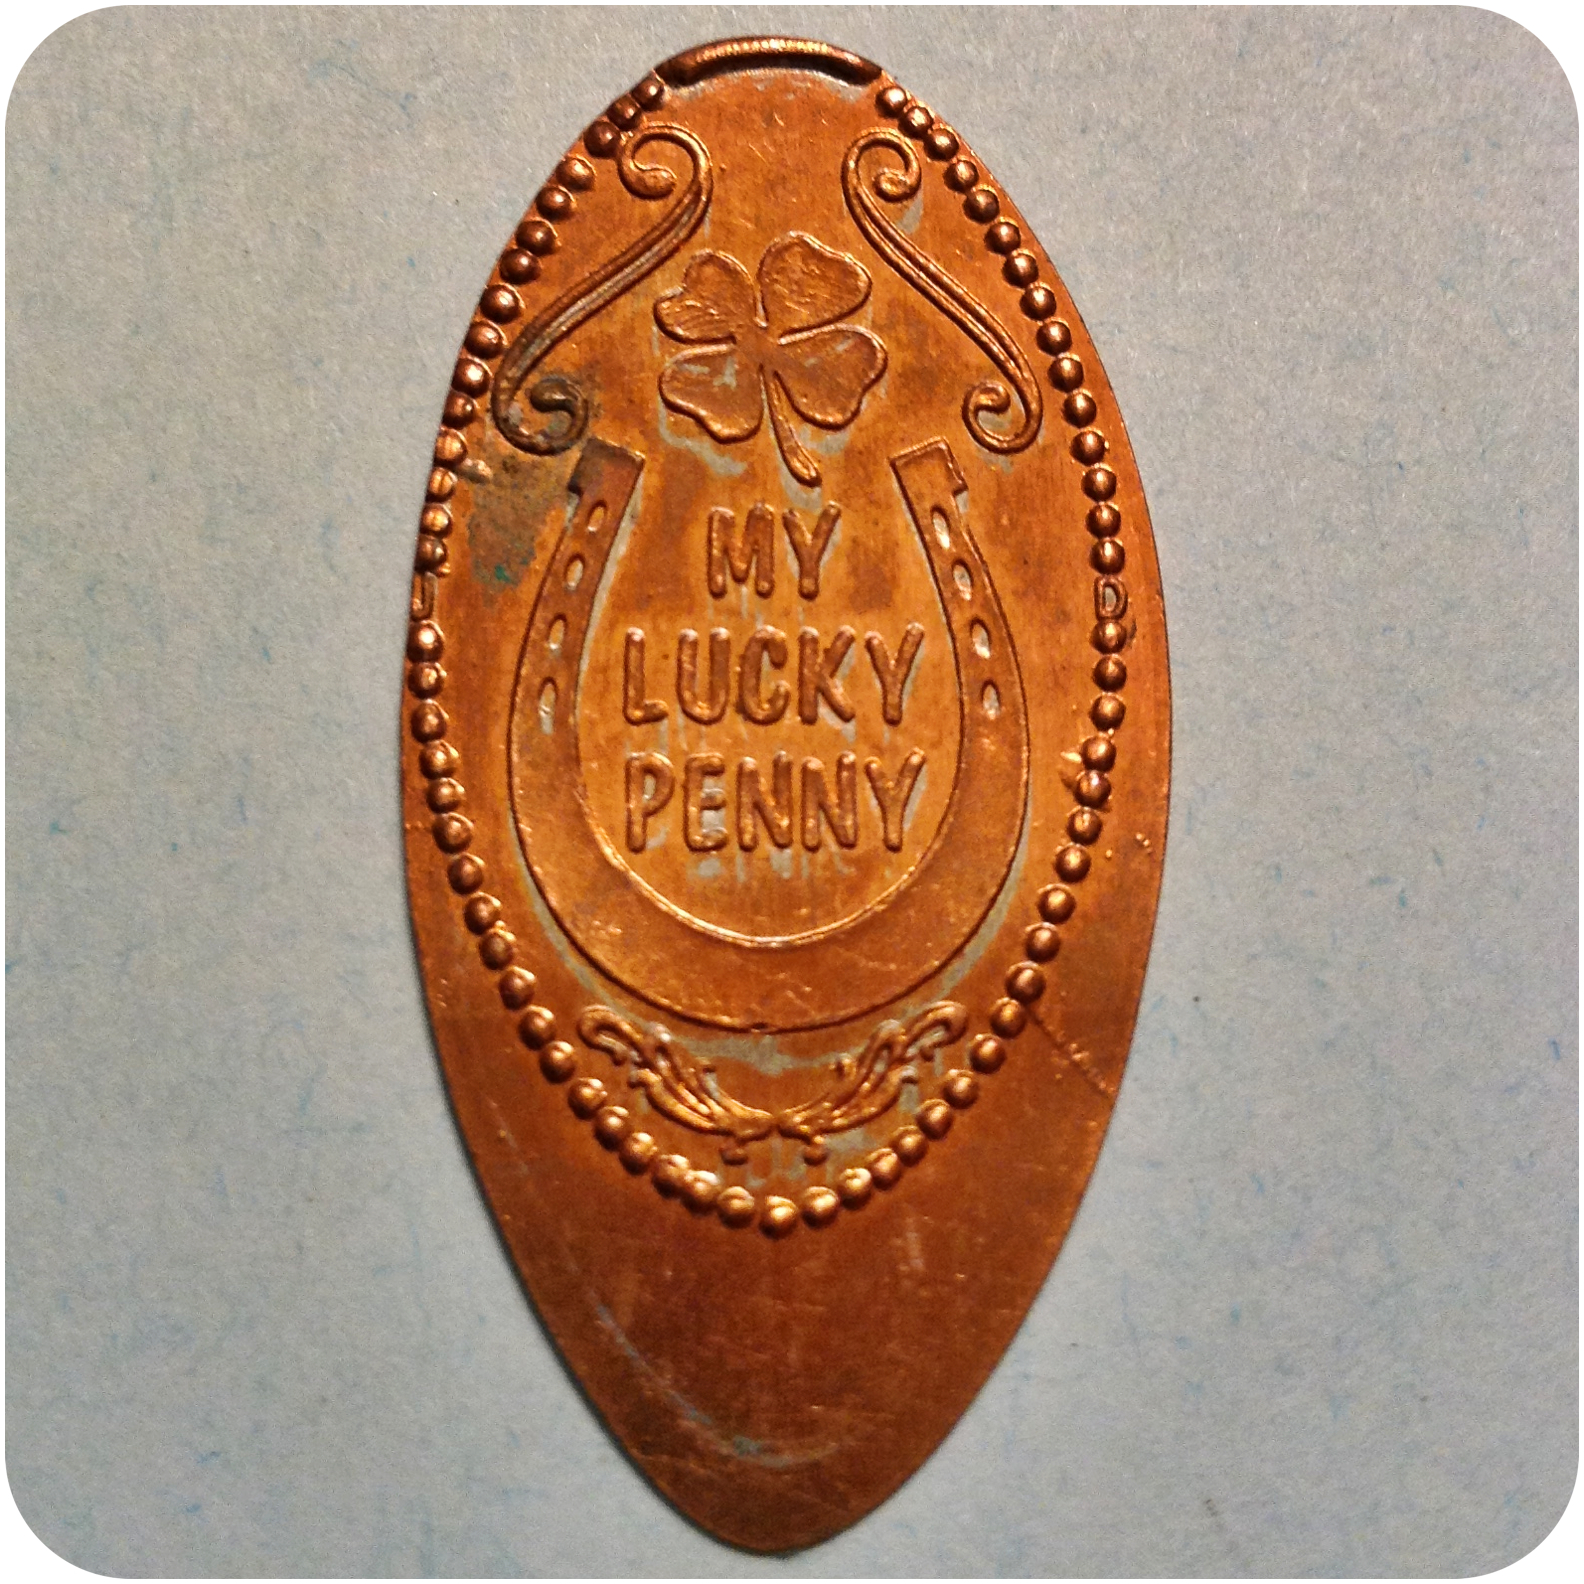 My Lucky Penny, Four Leaf Clover, Rustler's Rooste Restaurant Phoenix AZ Arizona